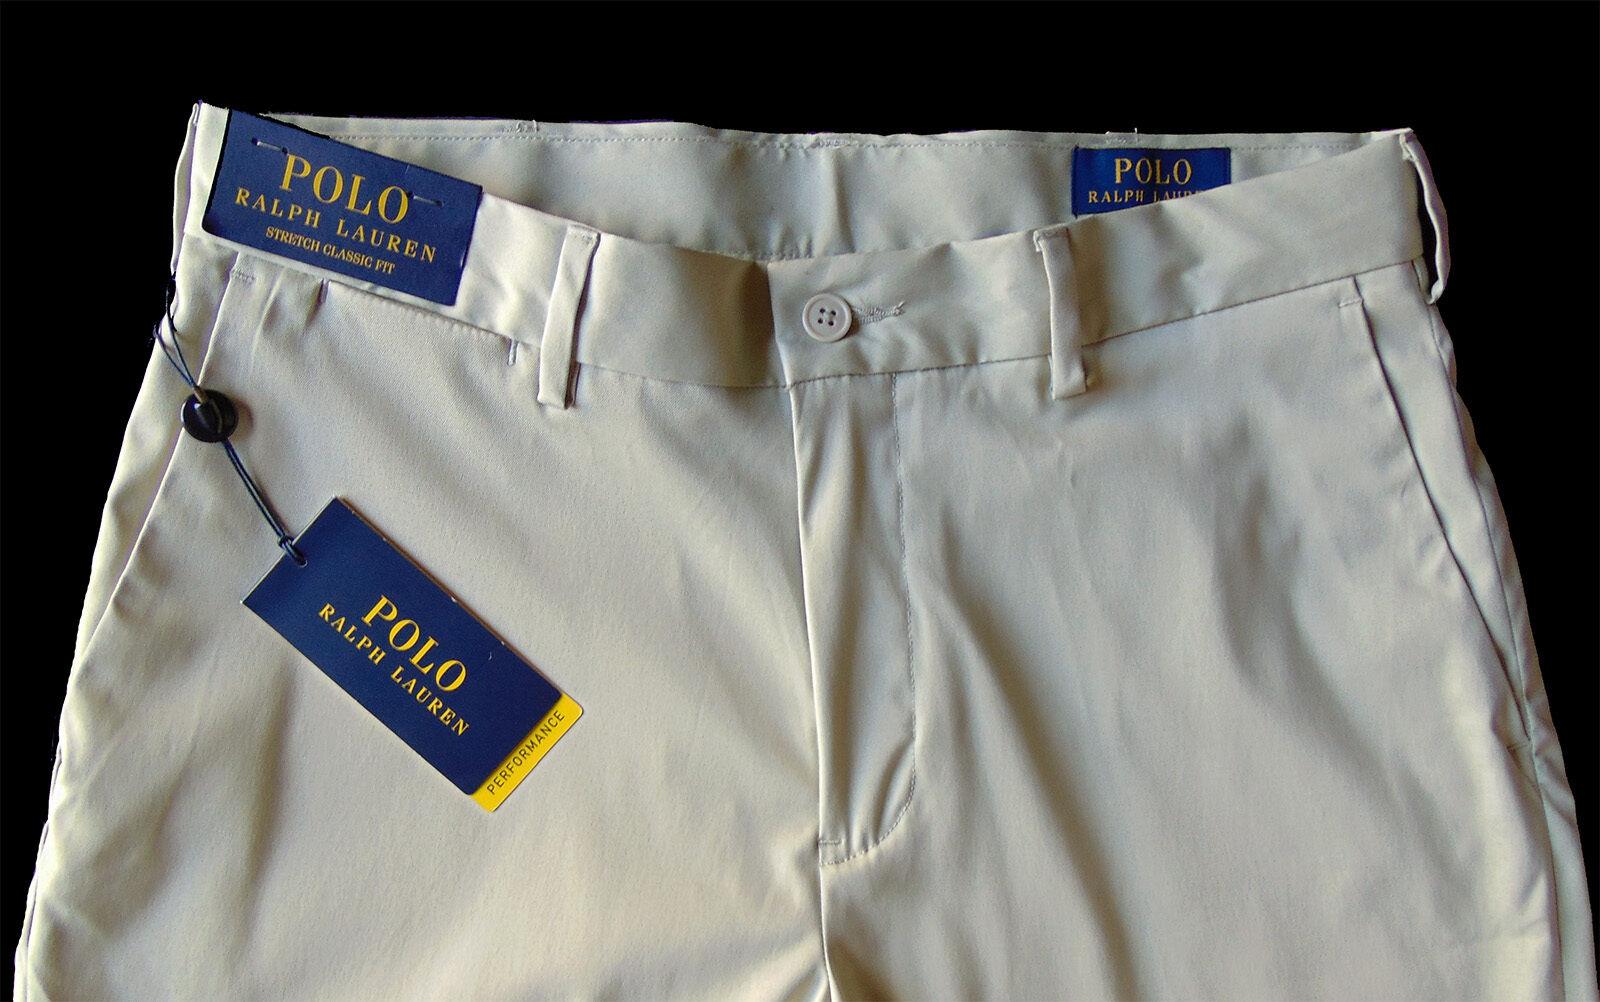 Men's POLO RALPH LAUREN Khaki Pants 30x30 Stretch Classic Fit Performance NWT